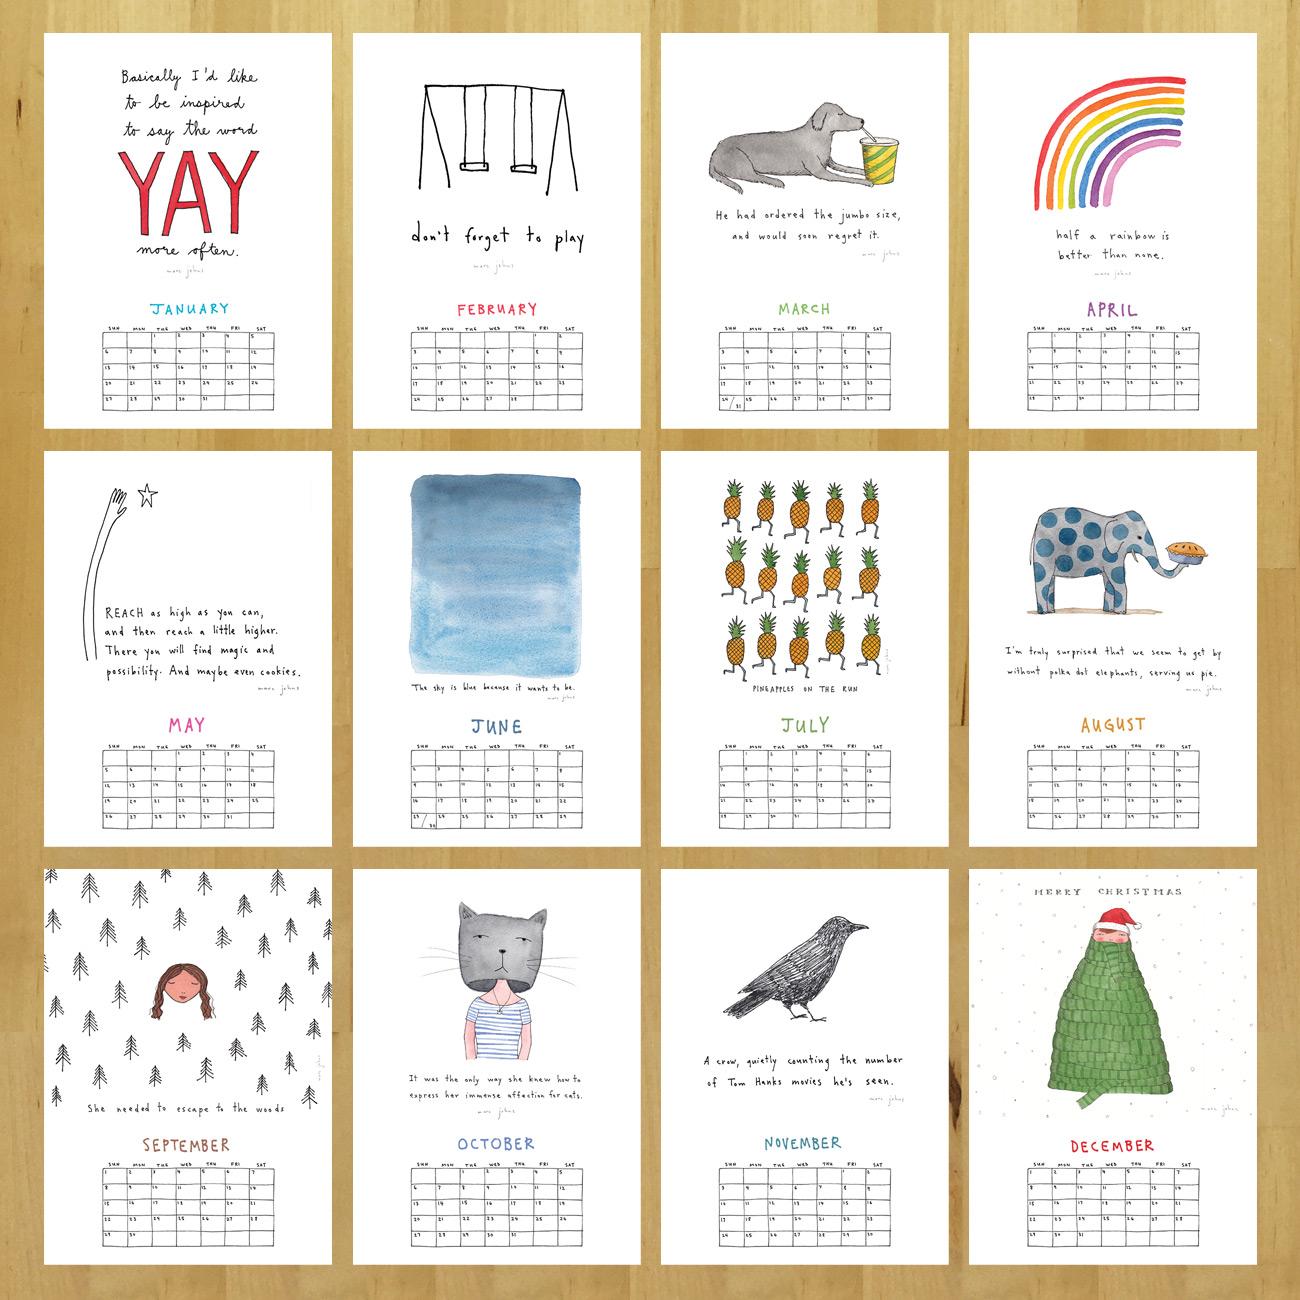 calendar-2019-grid.jpg